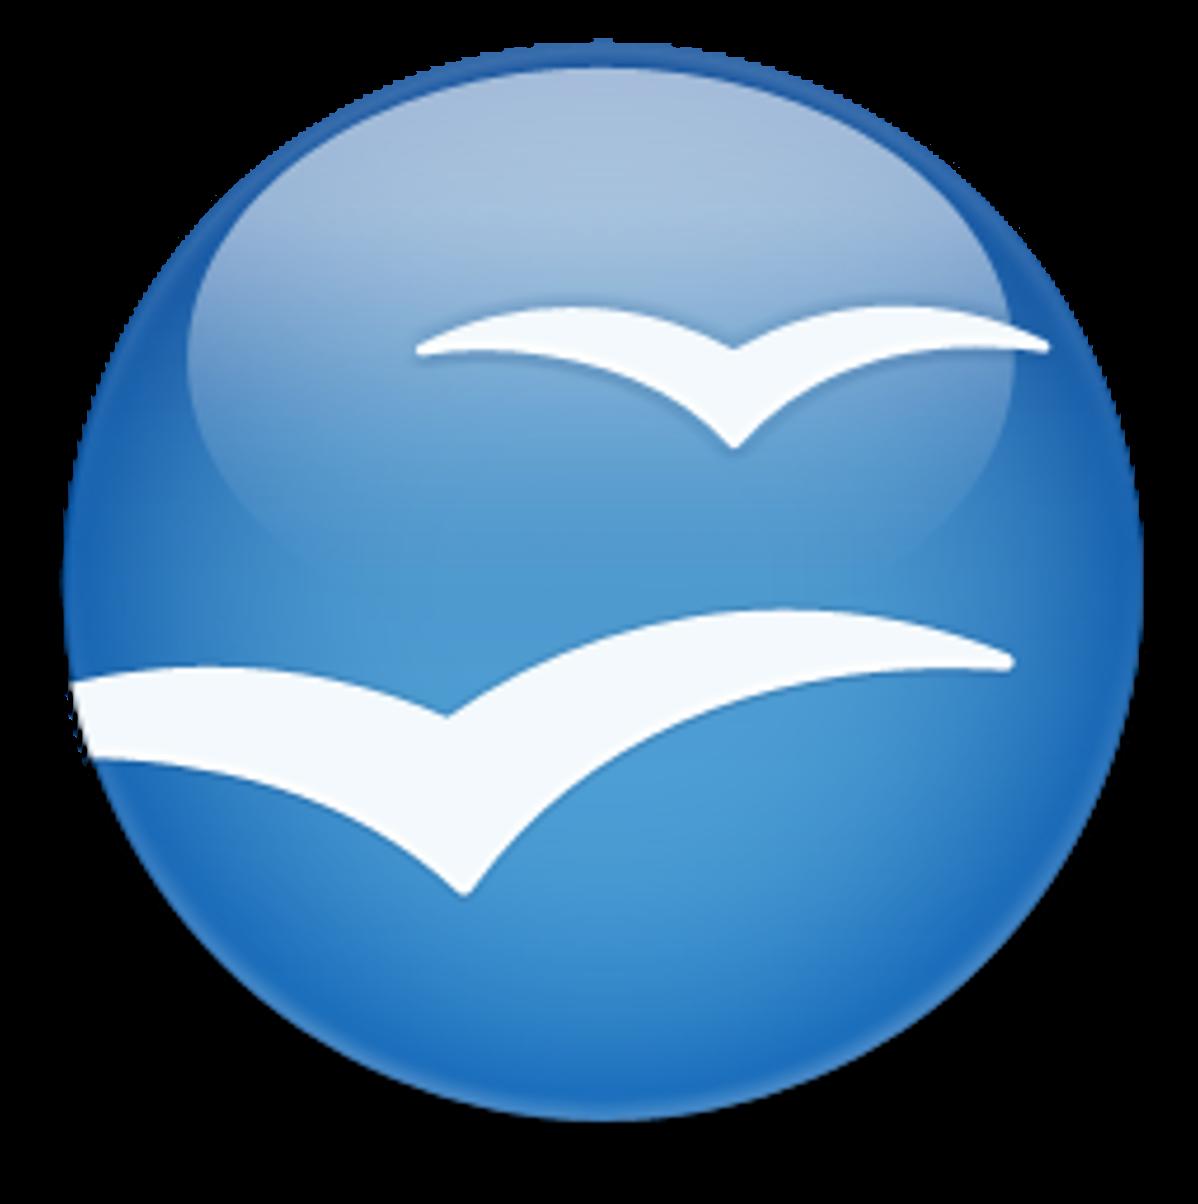 Программа для чистки браузера - 976a7